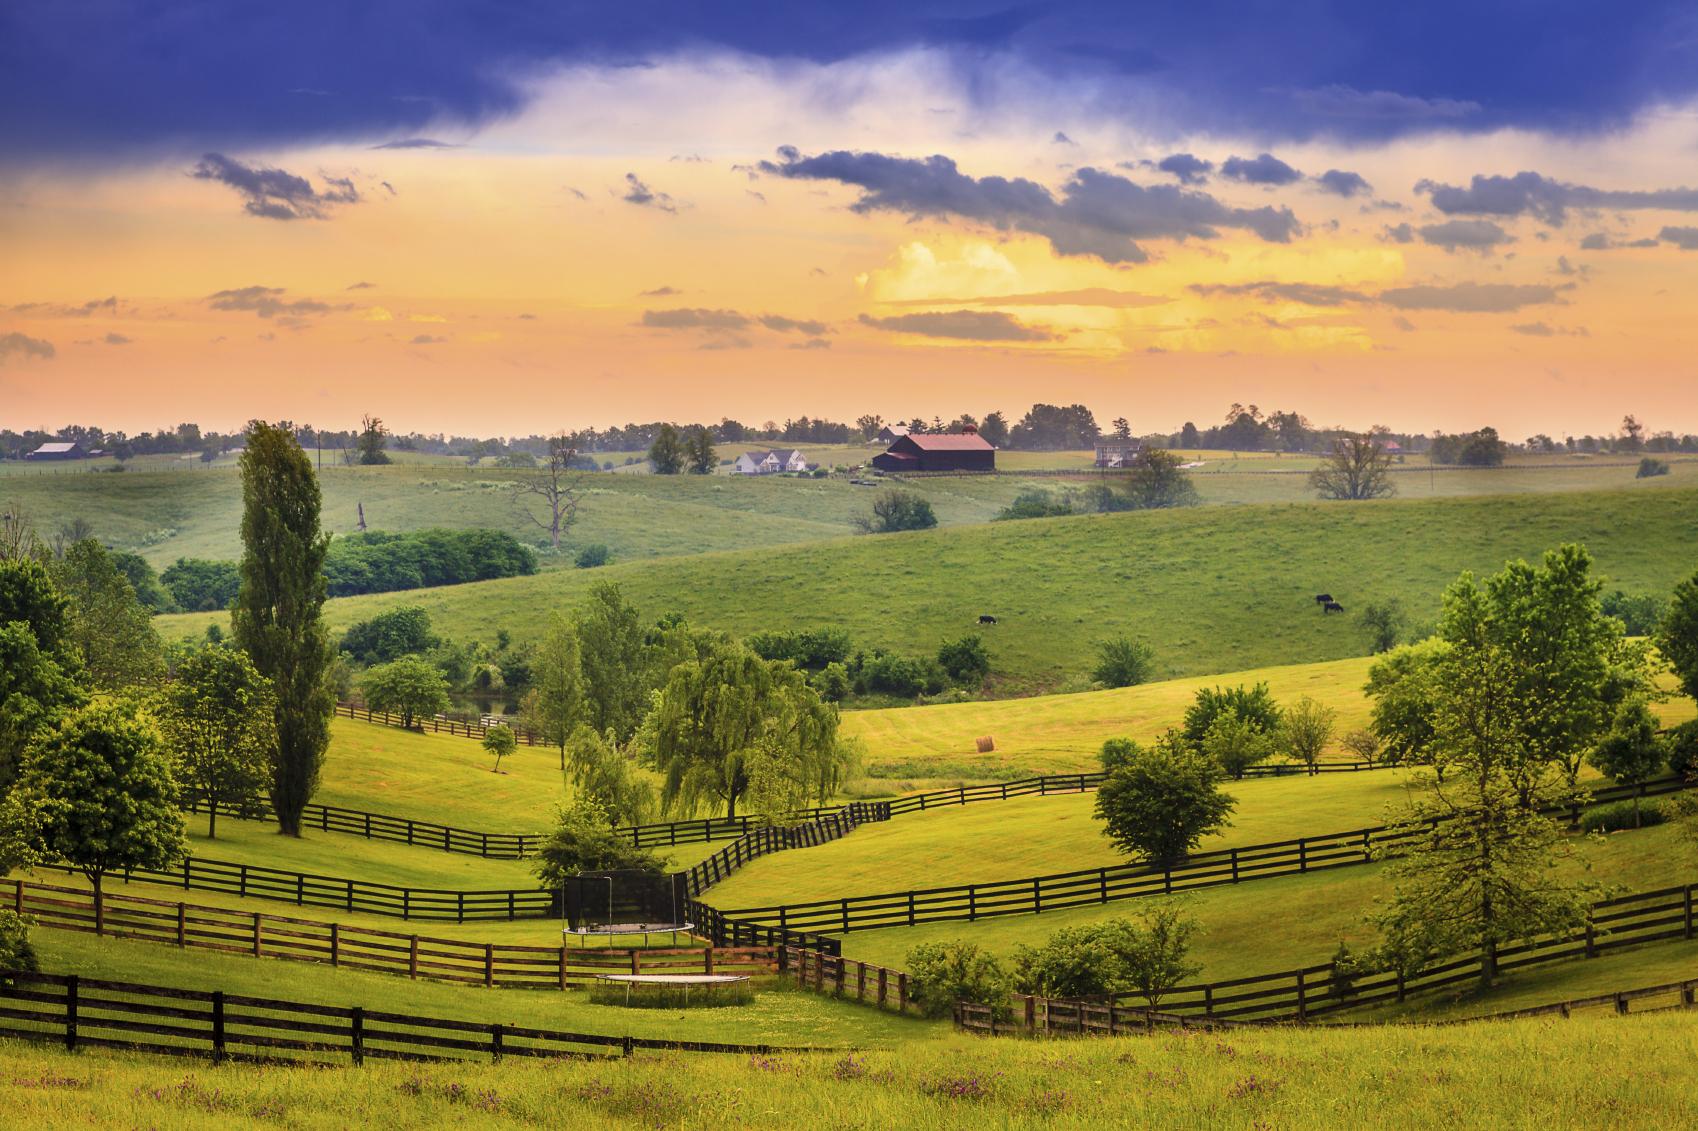 United Ways in Kentucky | United Way Worldwide